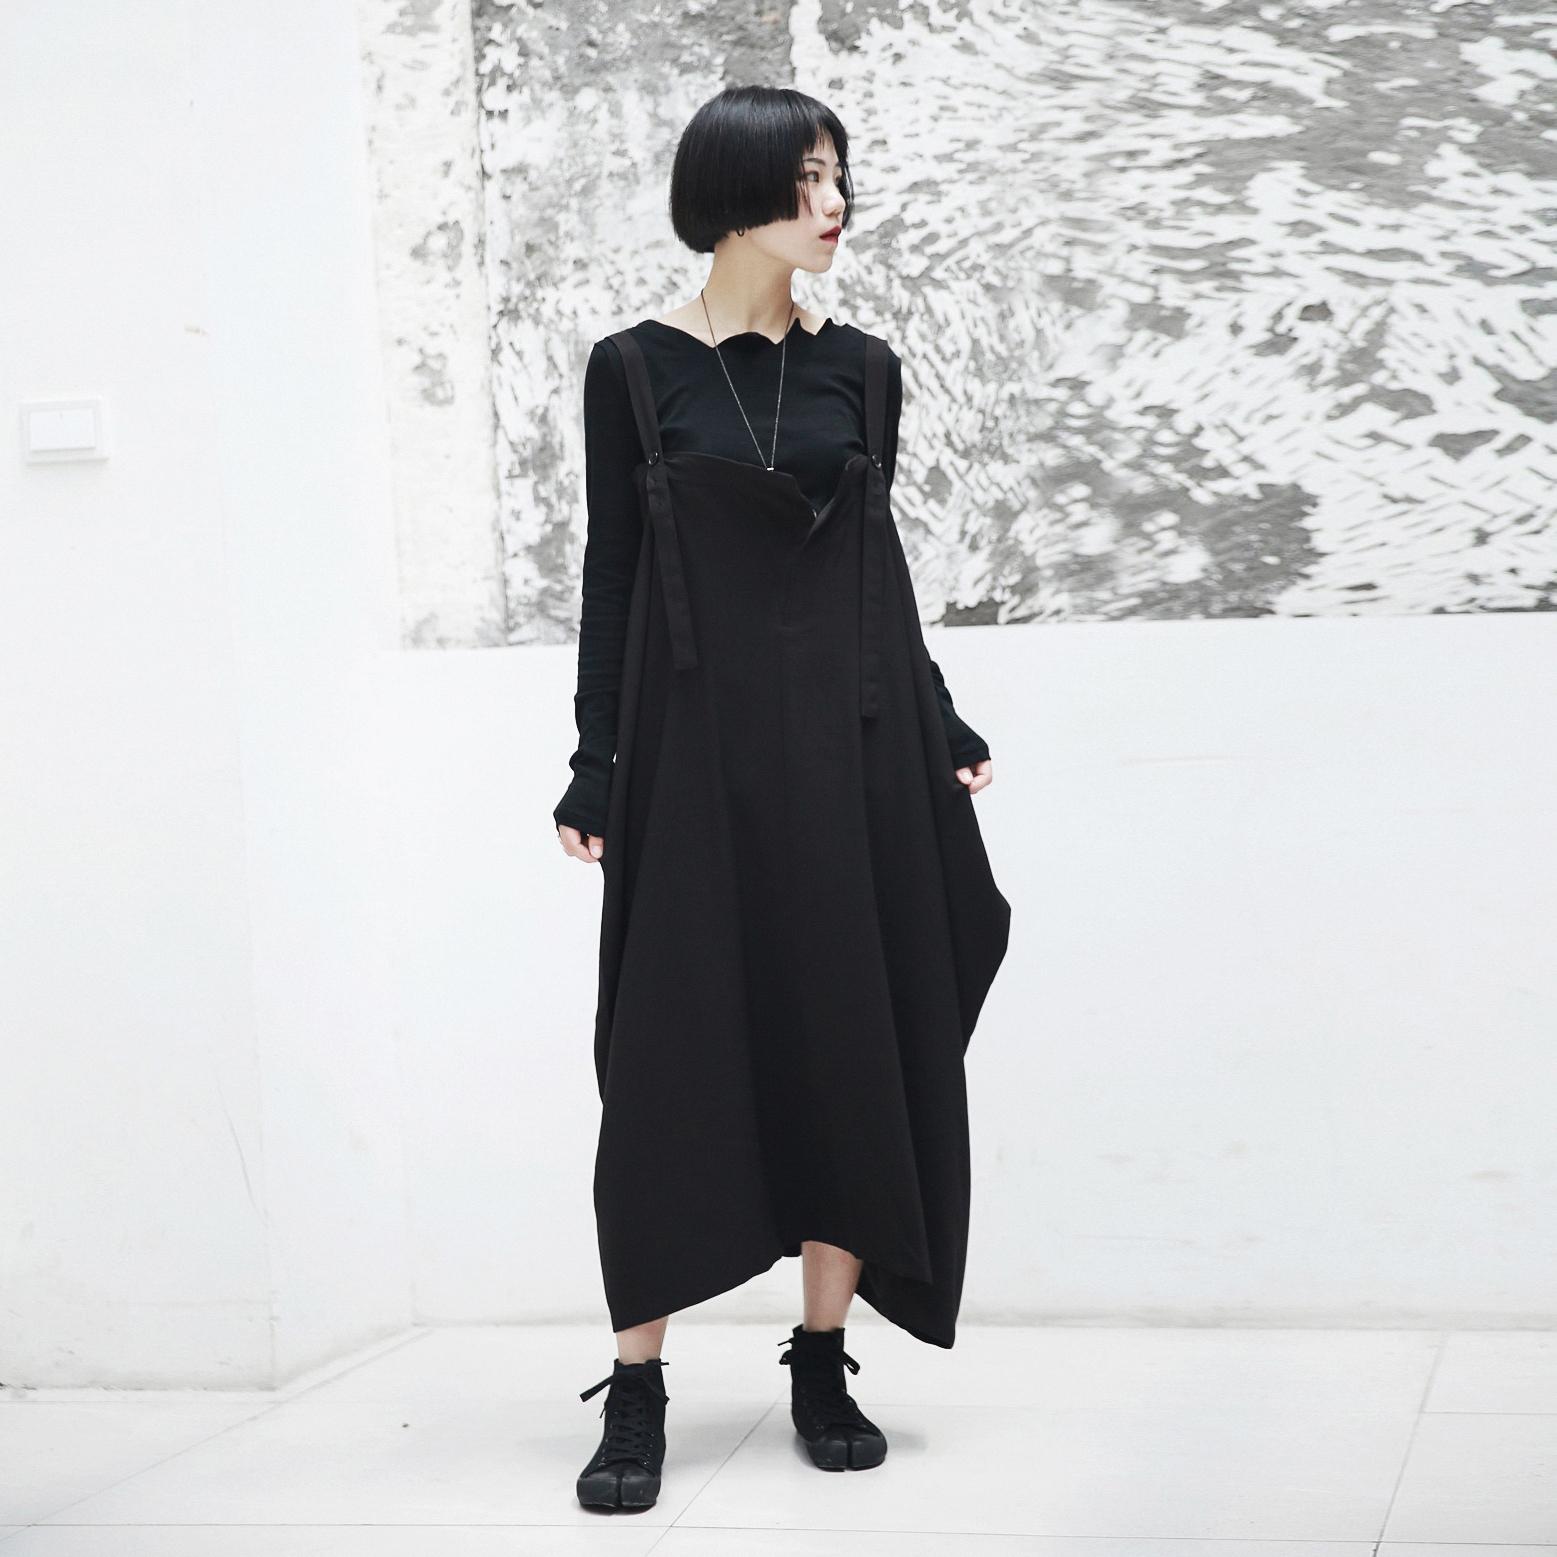 SIMPLE BLACK 2018秋冬AW暗黑风大口袋不规则宽松背带连衣裙 女